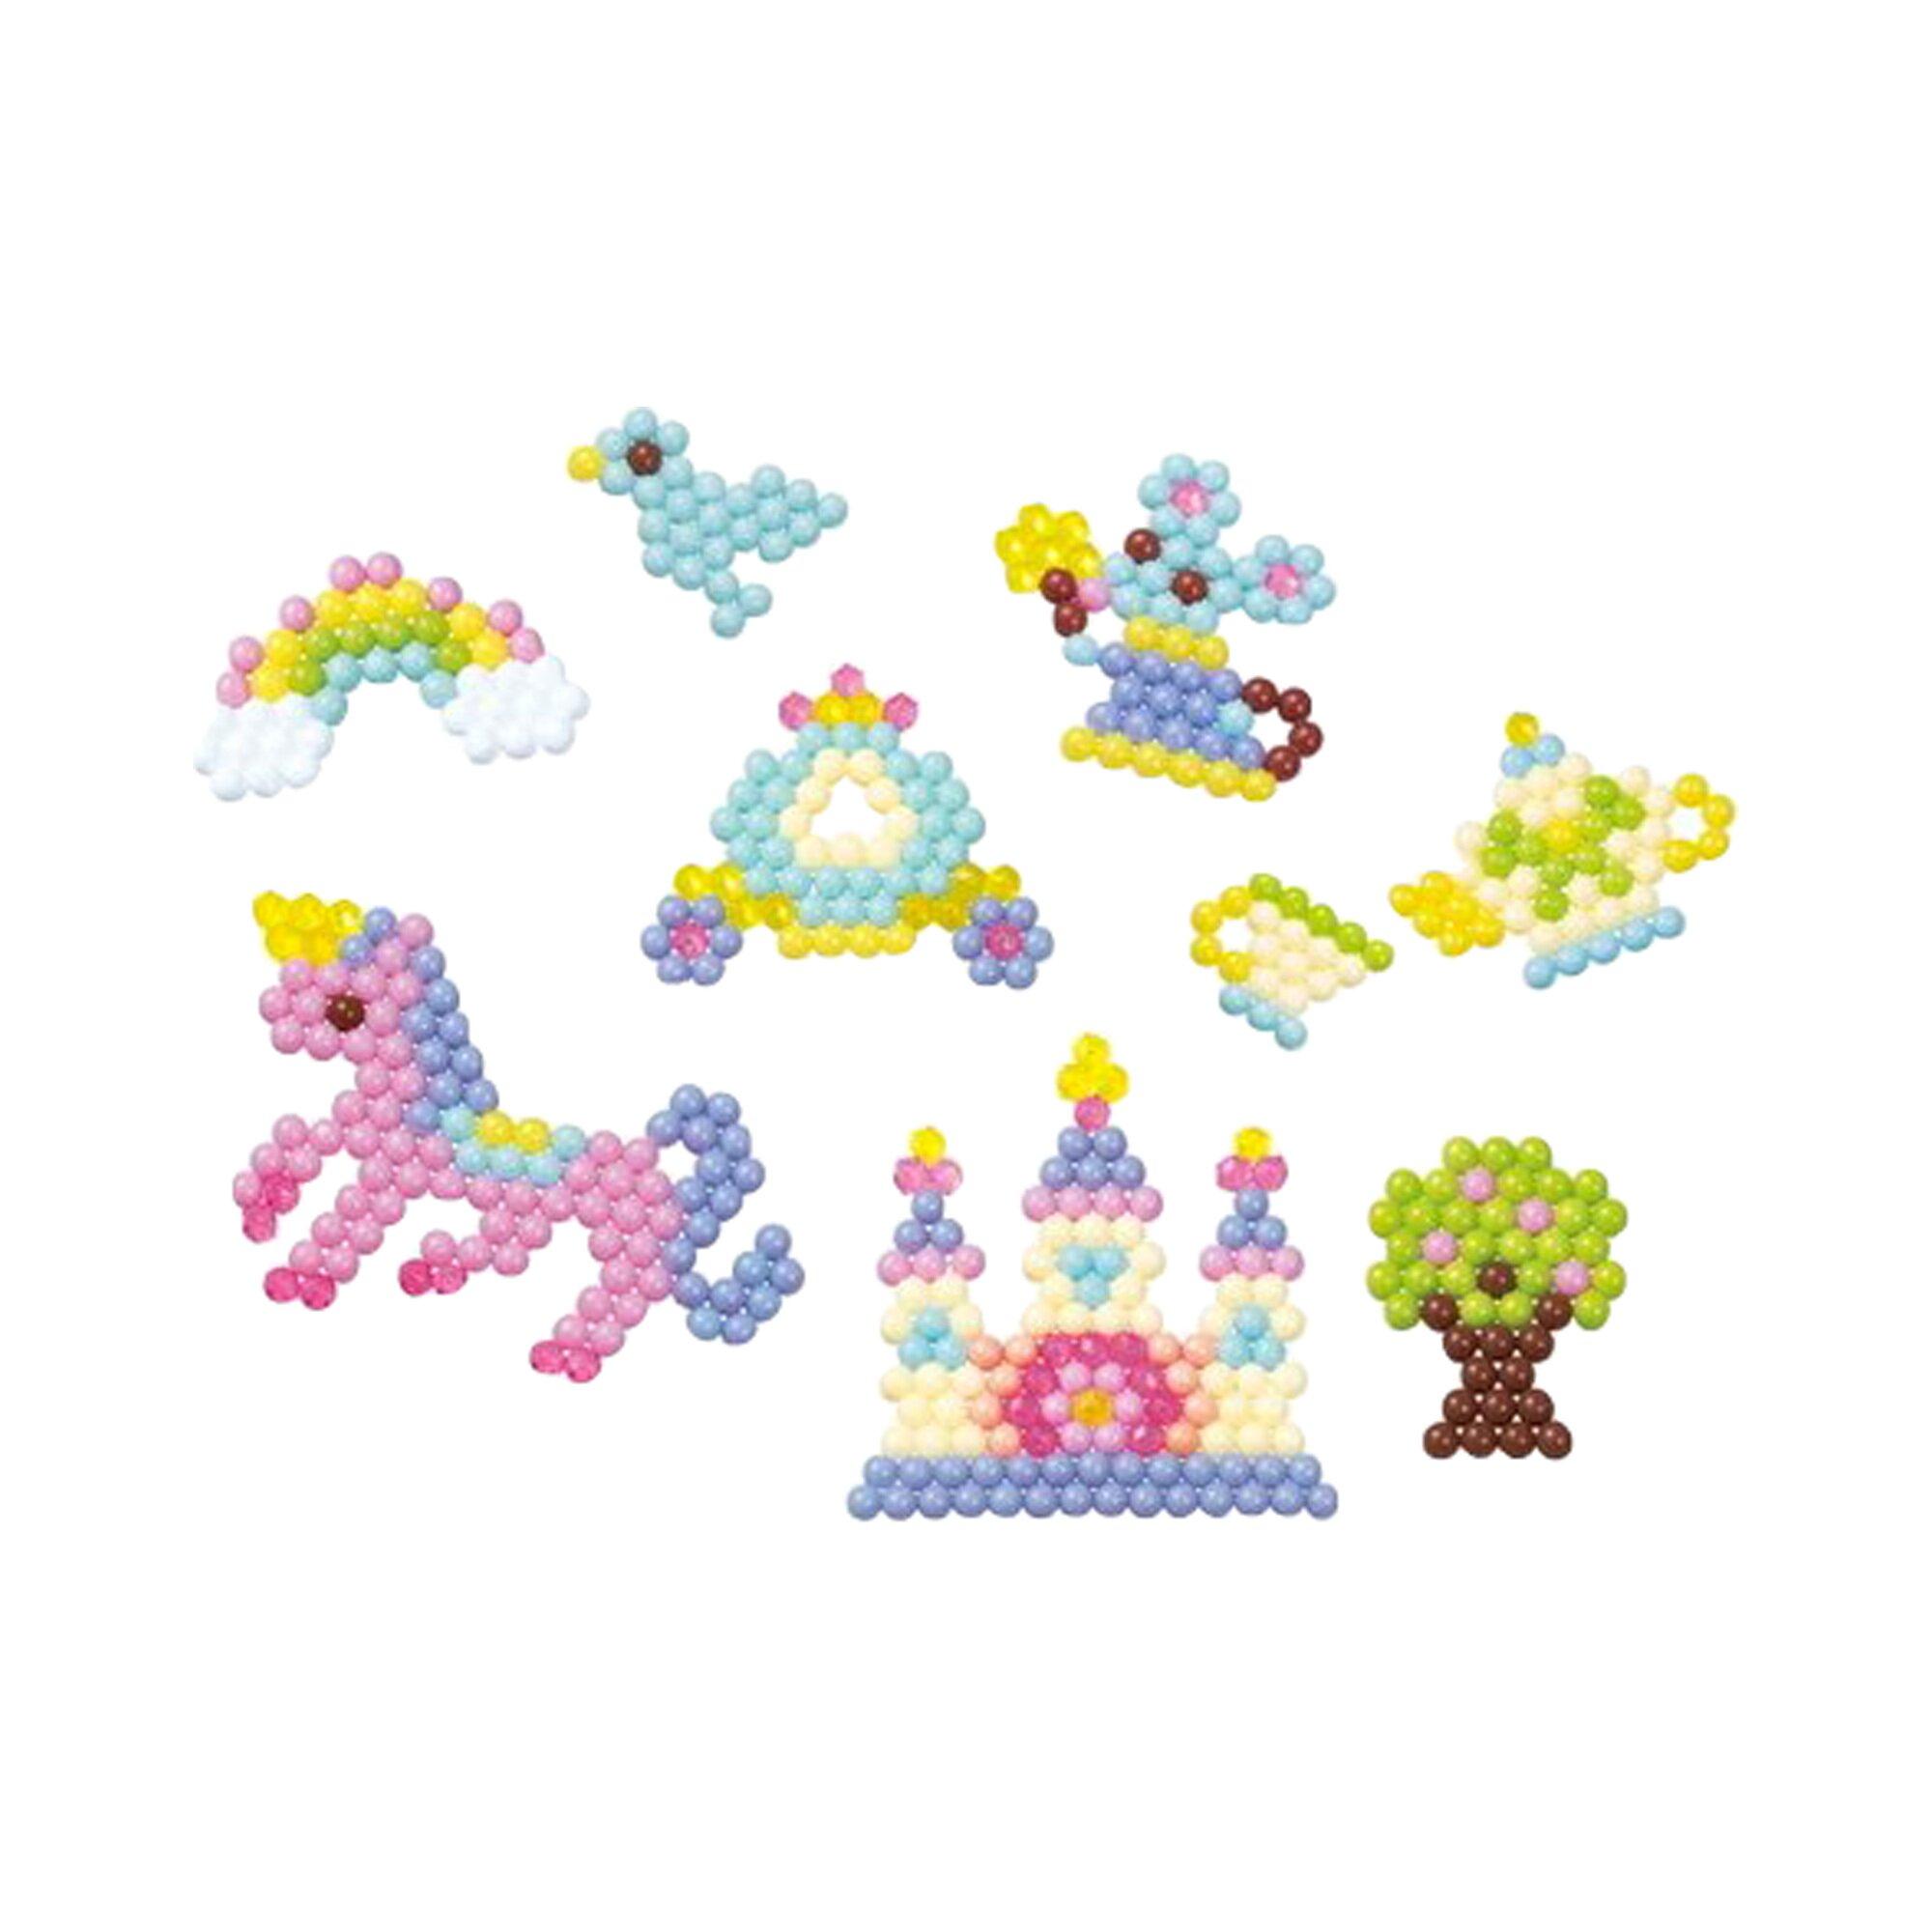 aquabeads-perlen-nachfull-set-pastell-marchenwelt